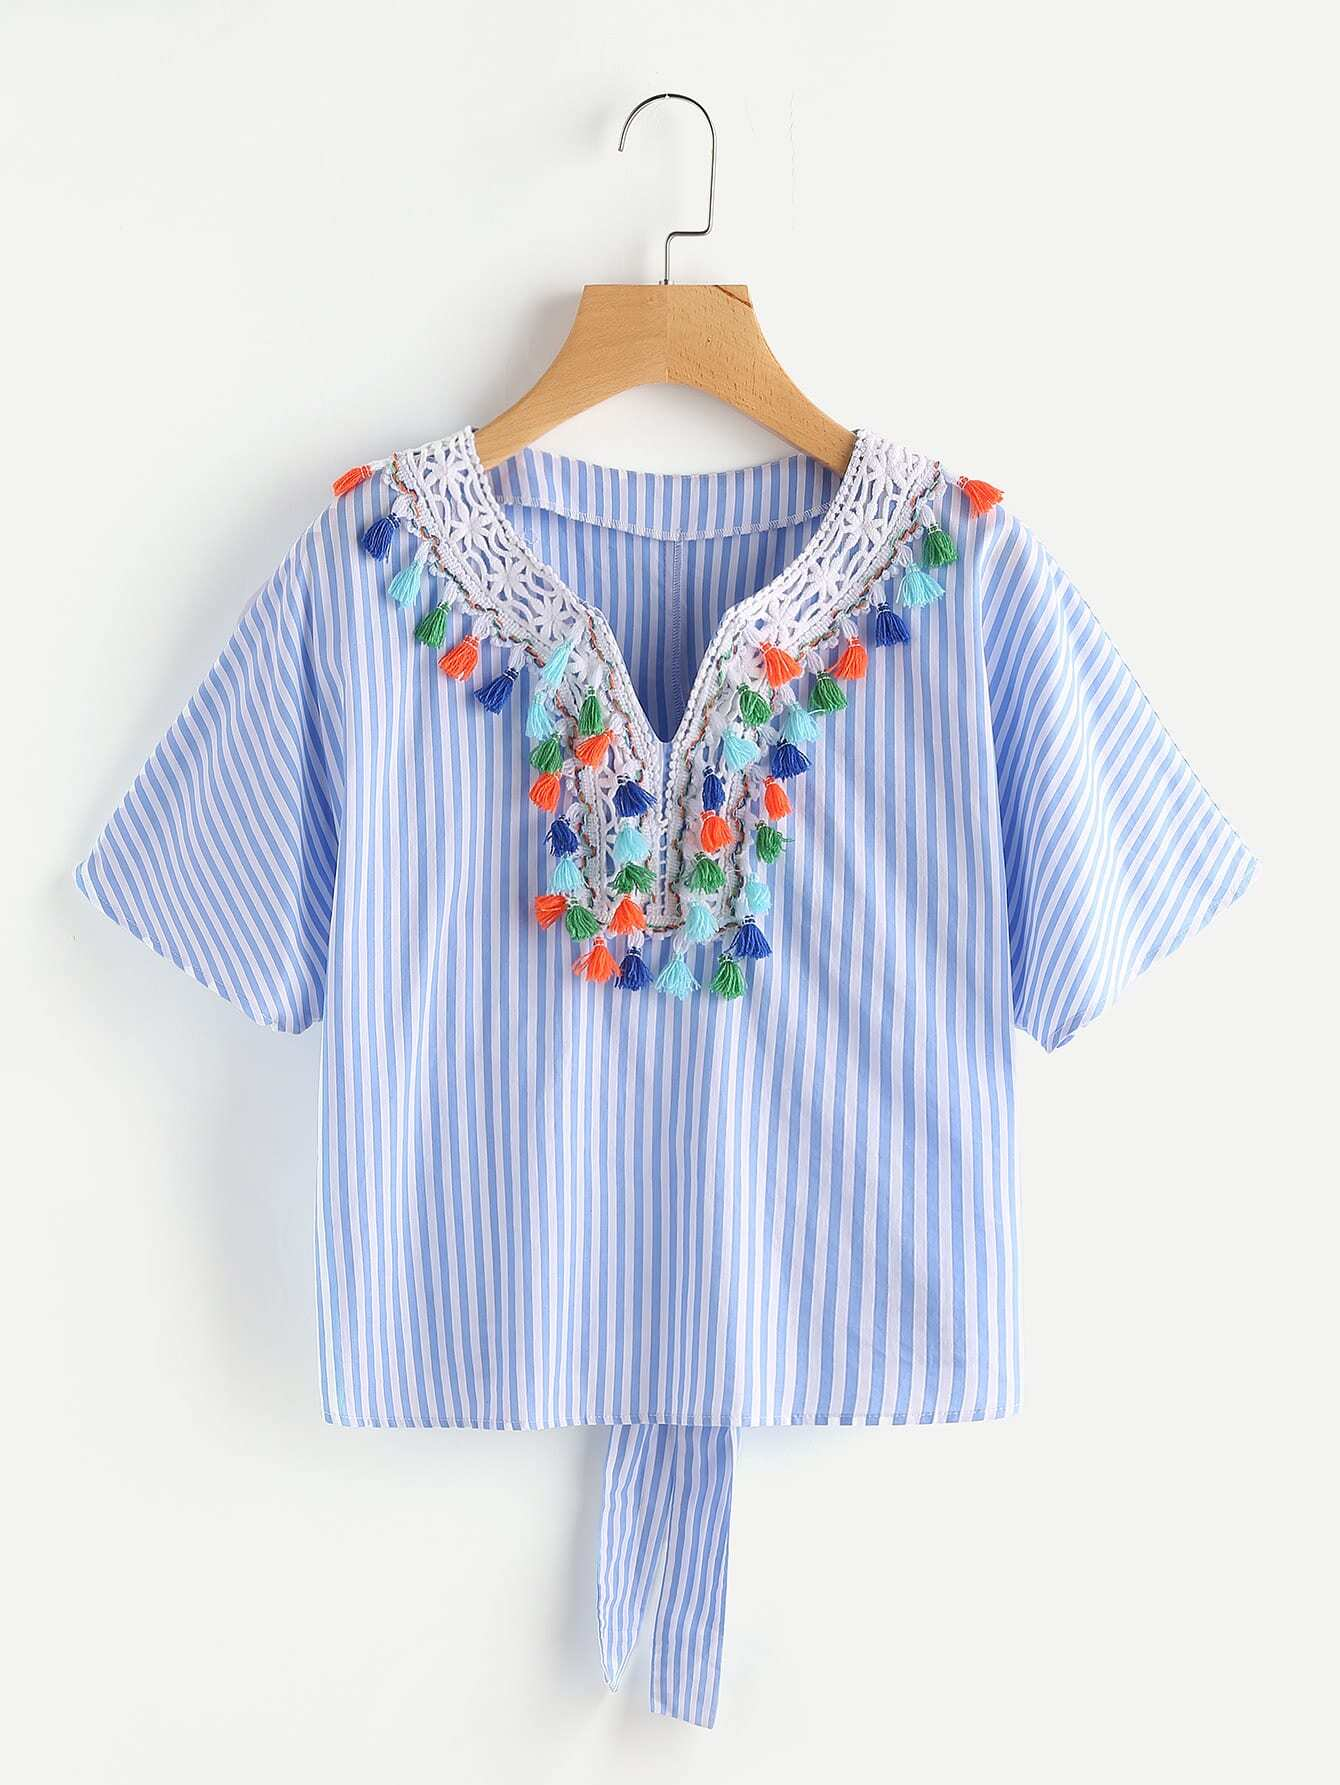 V Notch Tassel Trim Tie Back Top blouse170703706